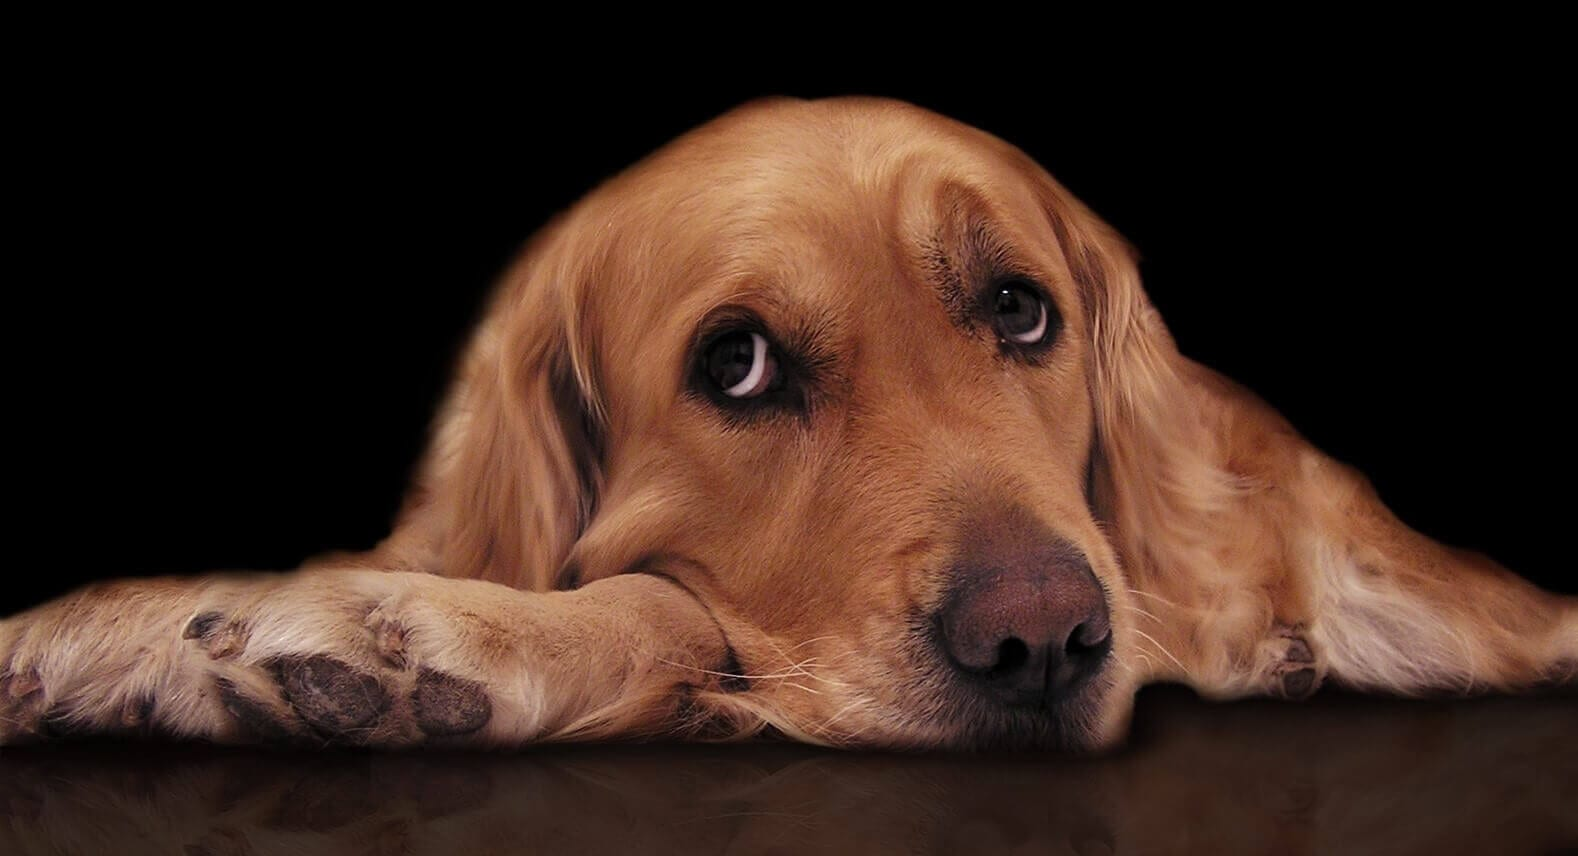 Hemp oil for dogs benefits